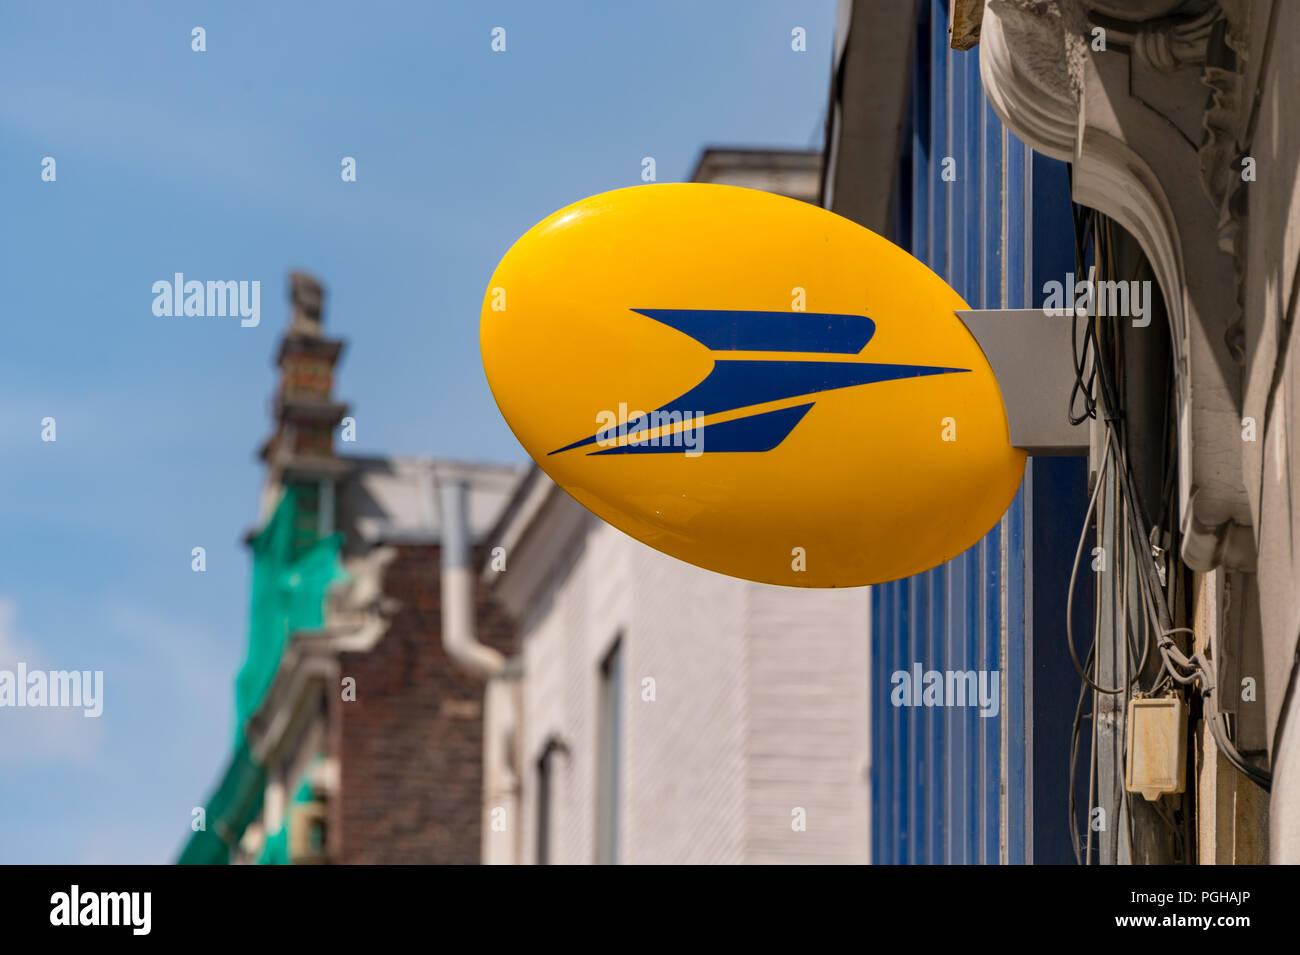 Lille, France - 15 June 2018: Logo of La Poste, French national postal service on Rue Nationale. - Stock Image